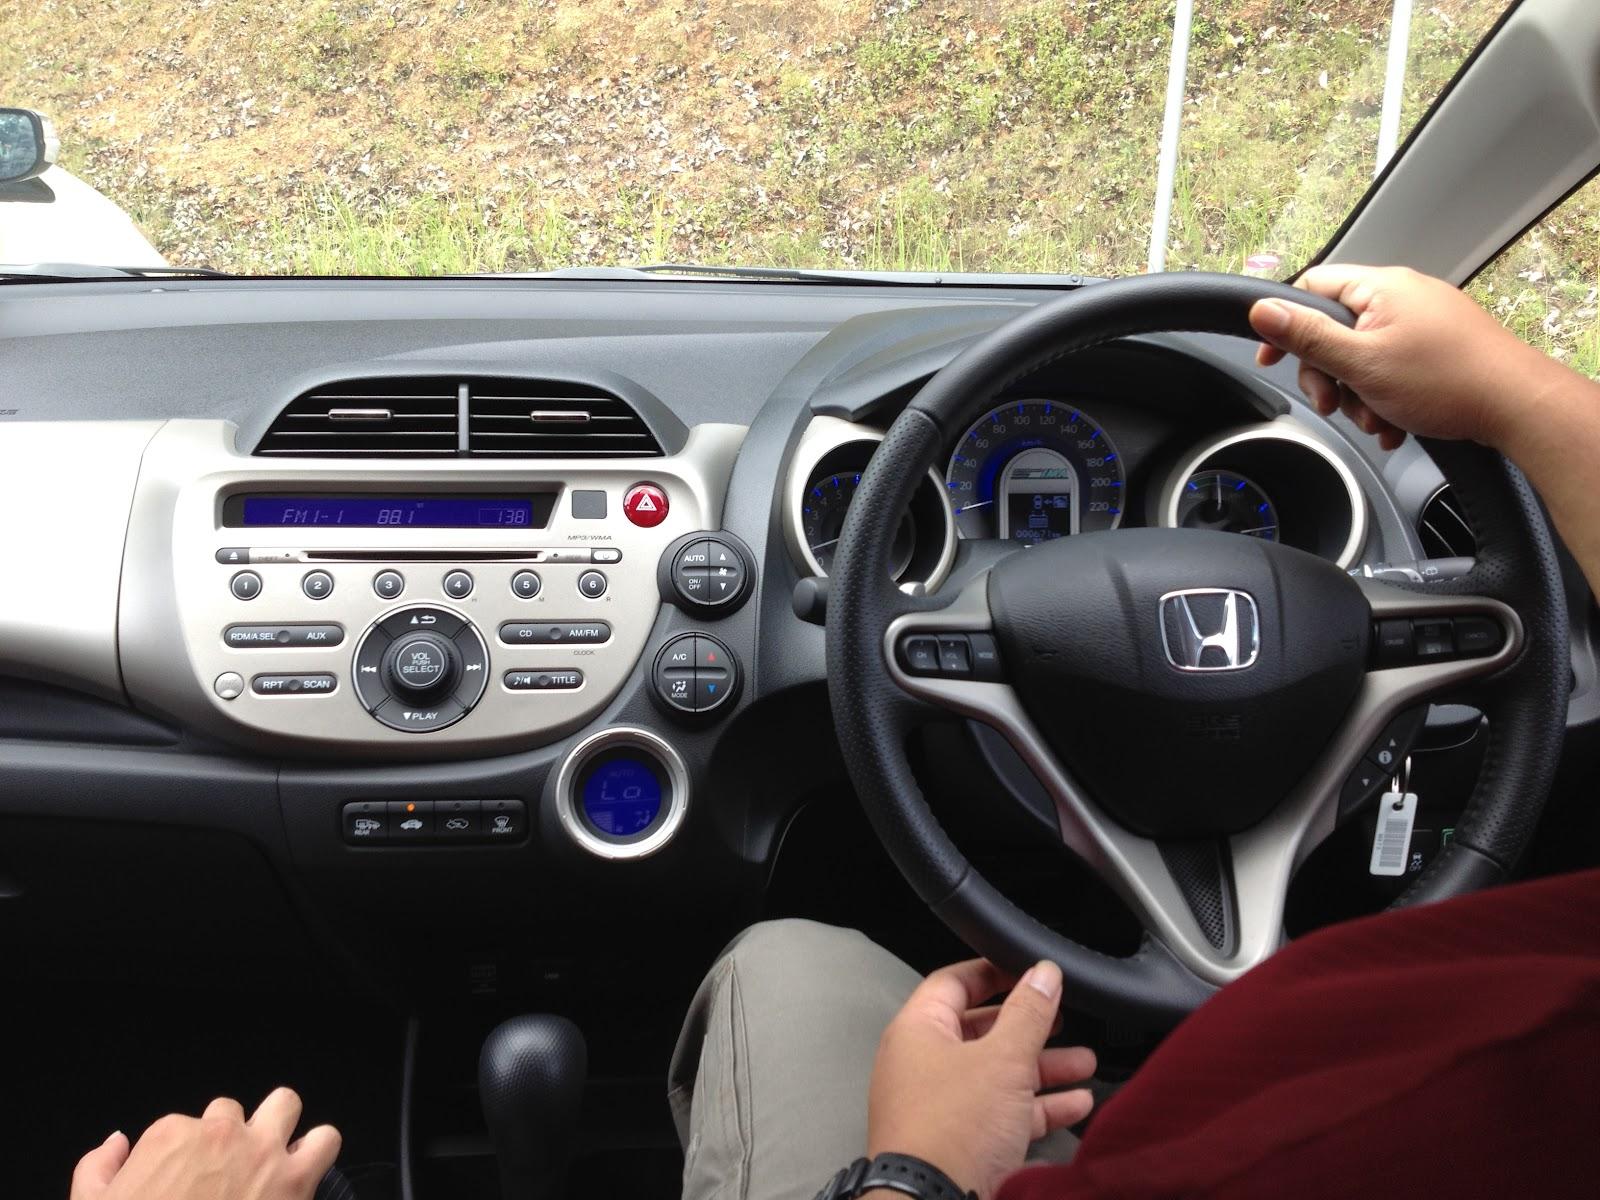 Toyota Prius C vs Honda Jazz Hybrid - The battle for the